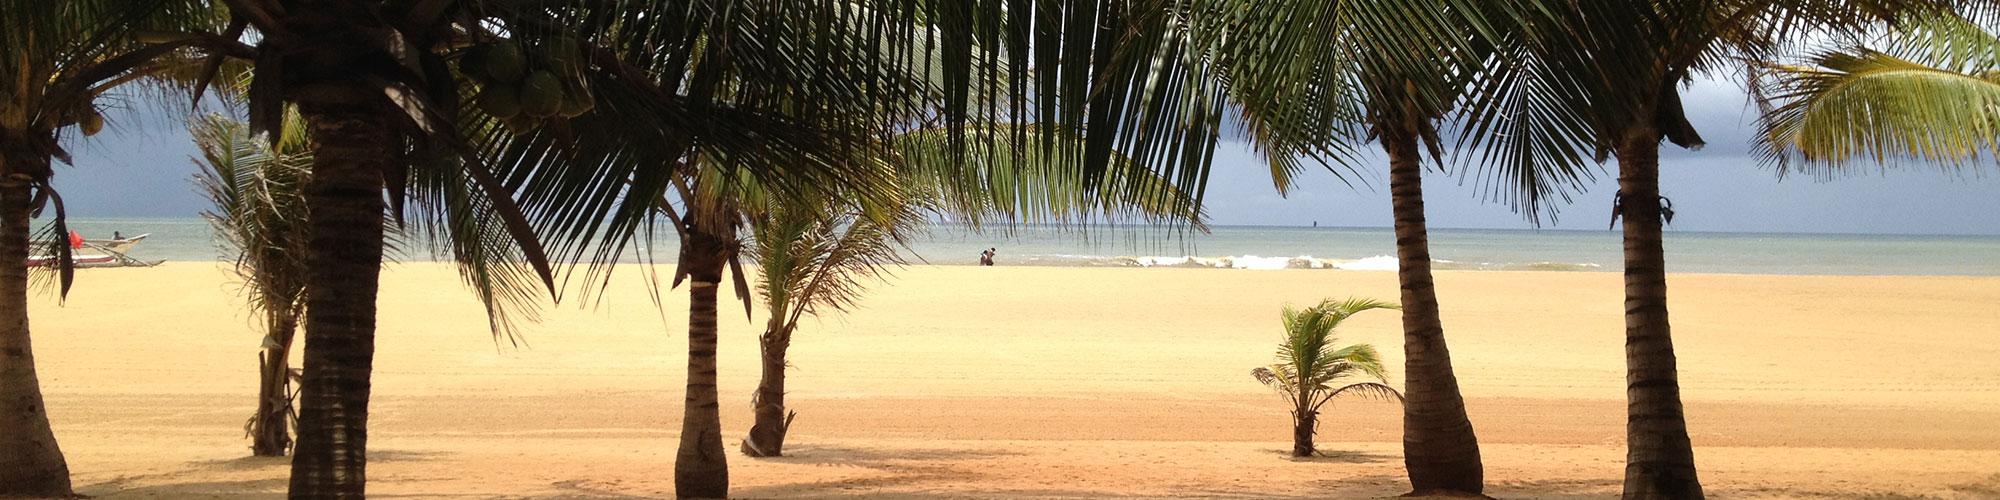 Beach negombo